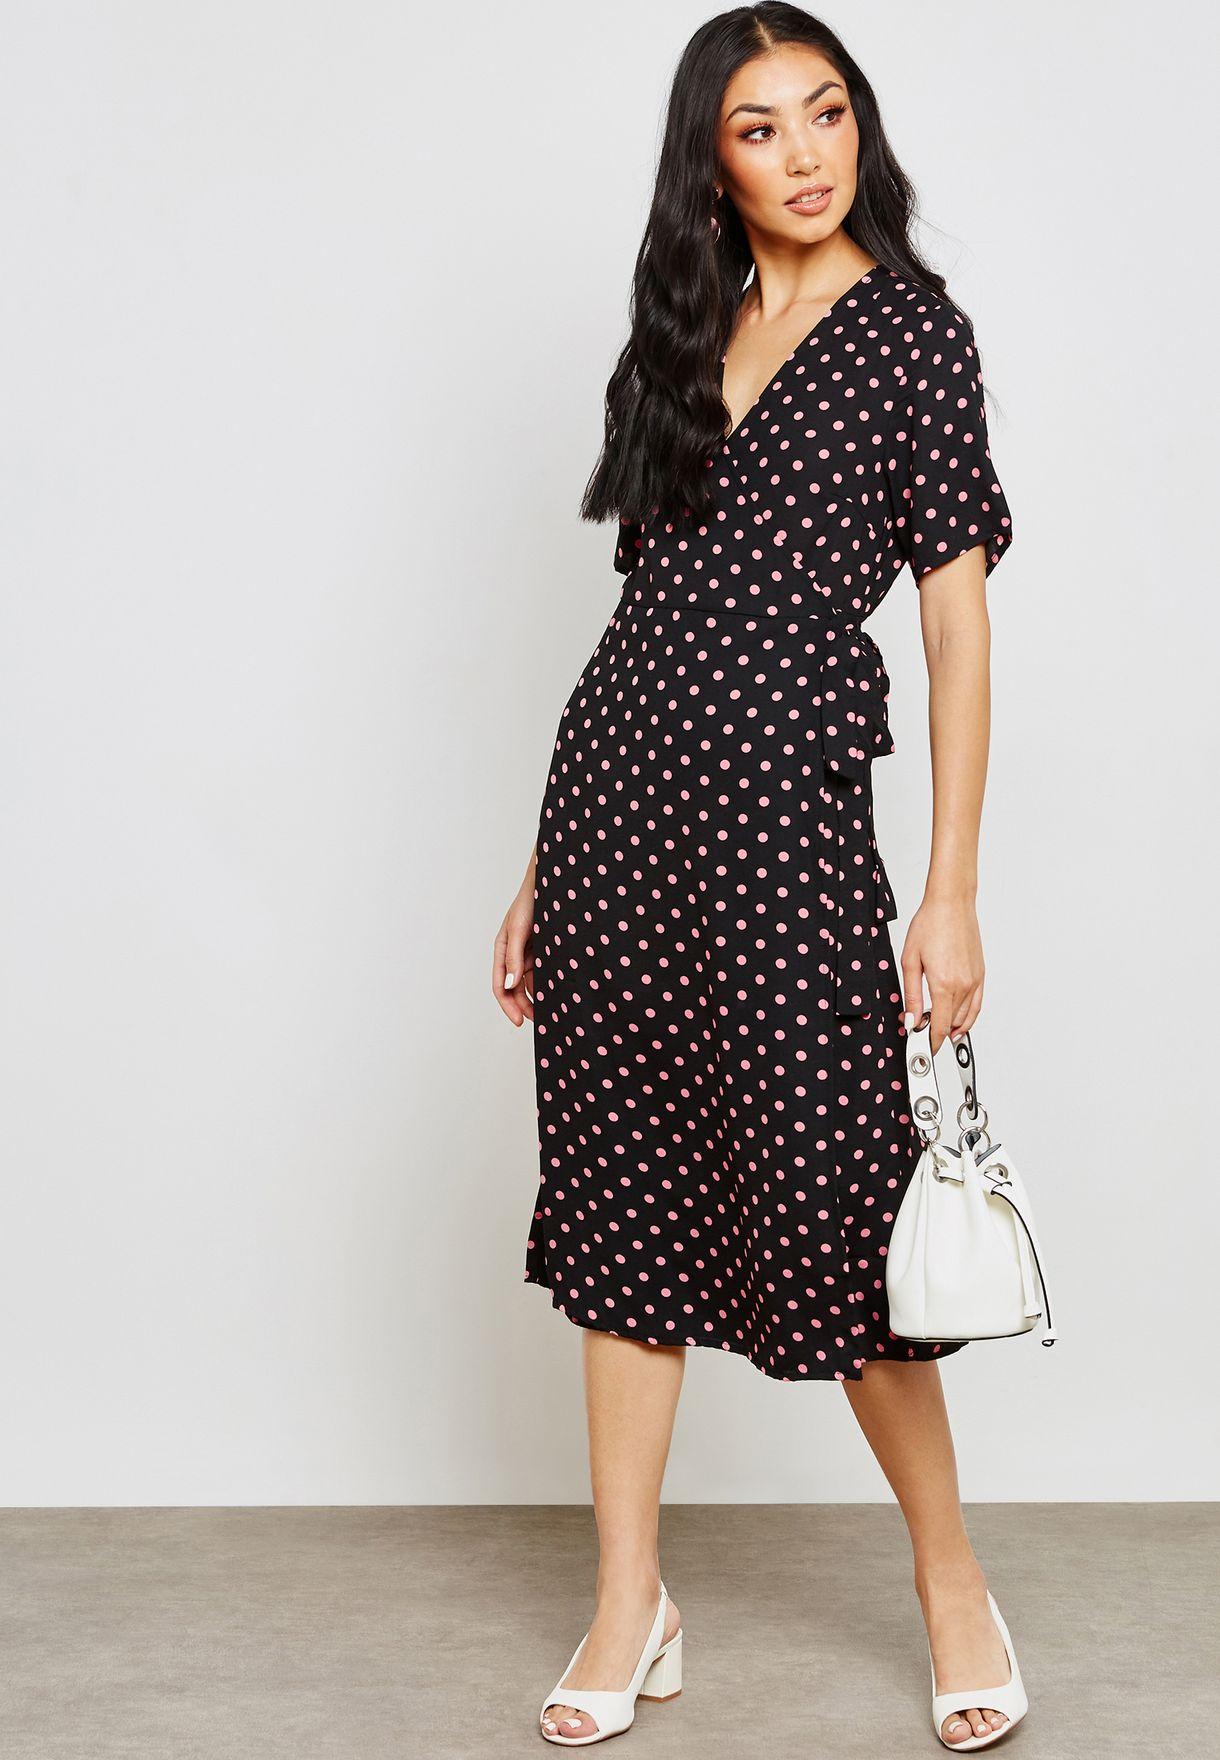 7e89888fdc4 Shop Vila prints Side Tie Waist Wrap Printed Dress 14052766 for ...